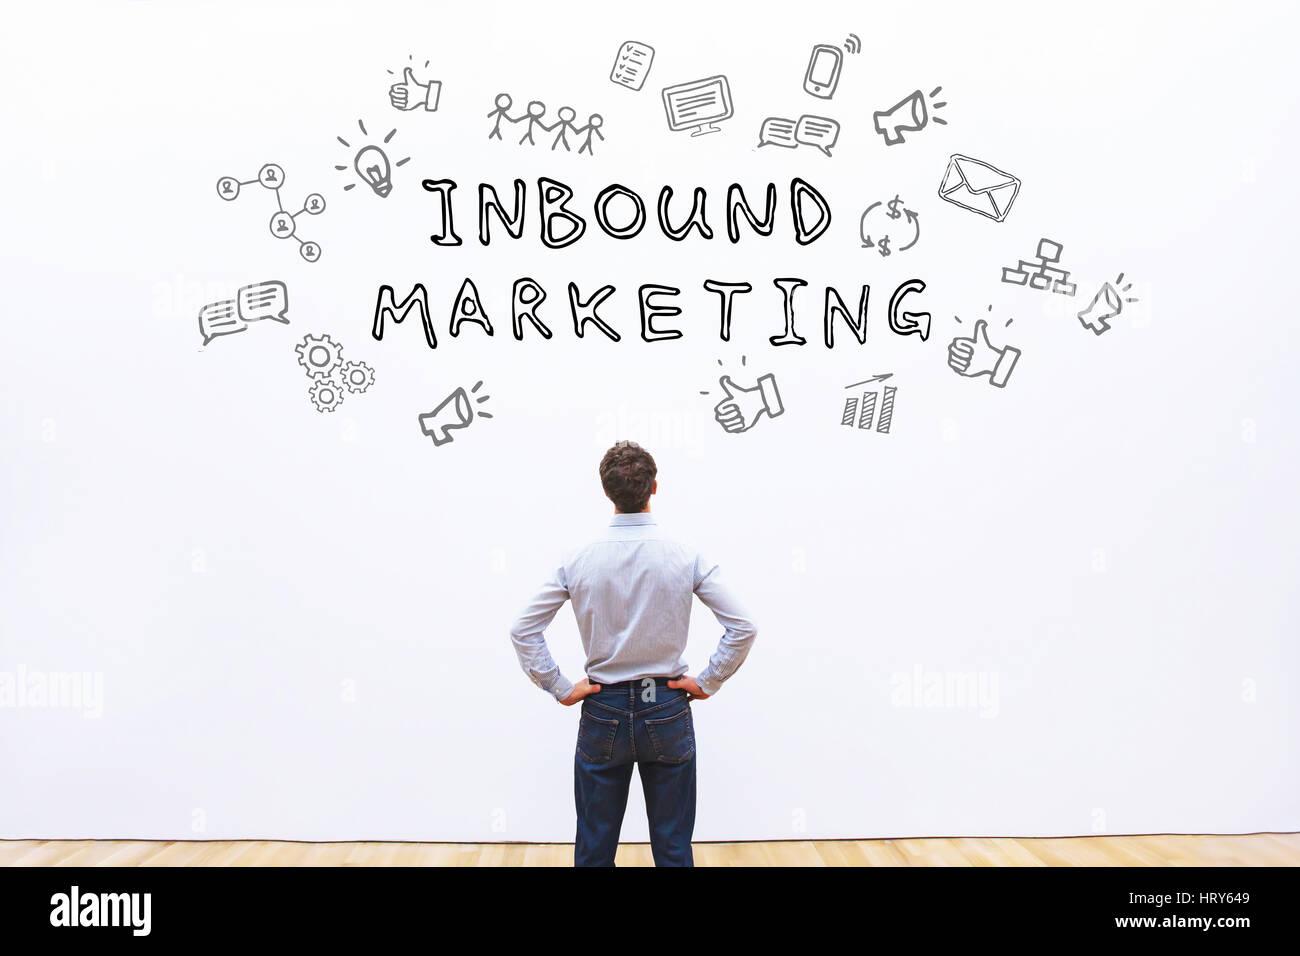 inbound marketing concept - Stock Image